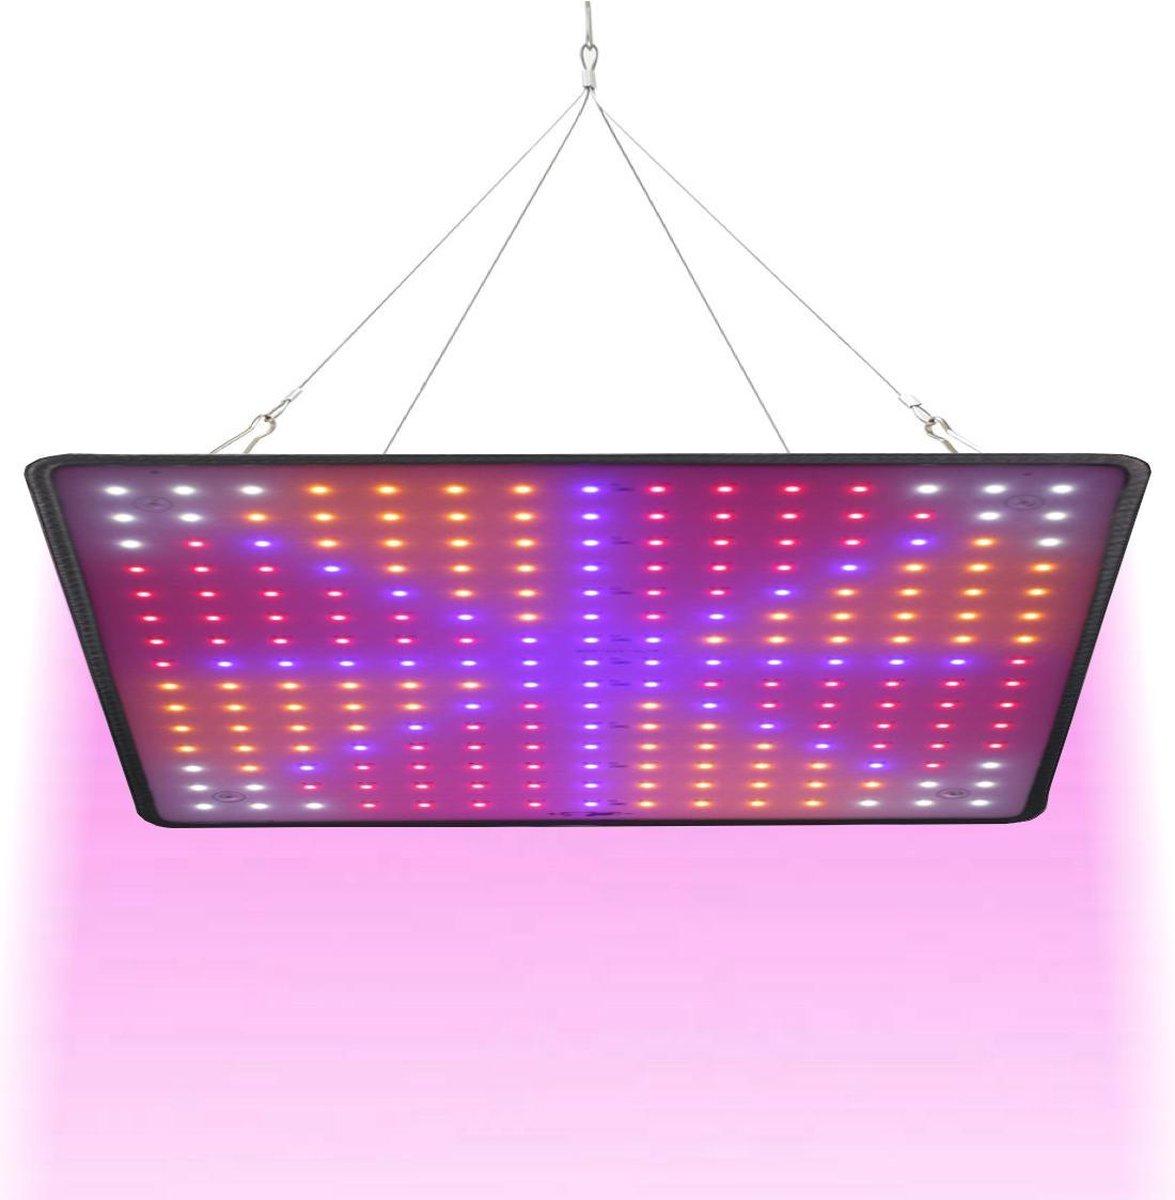 a sunny day LED groeilamp - kweeklamp - full spectrum - groei & bloei - grow light - groeilamp full